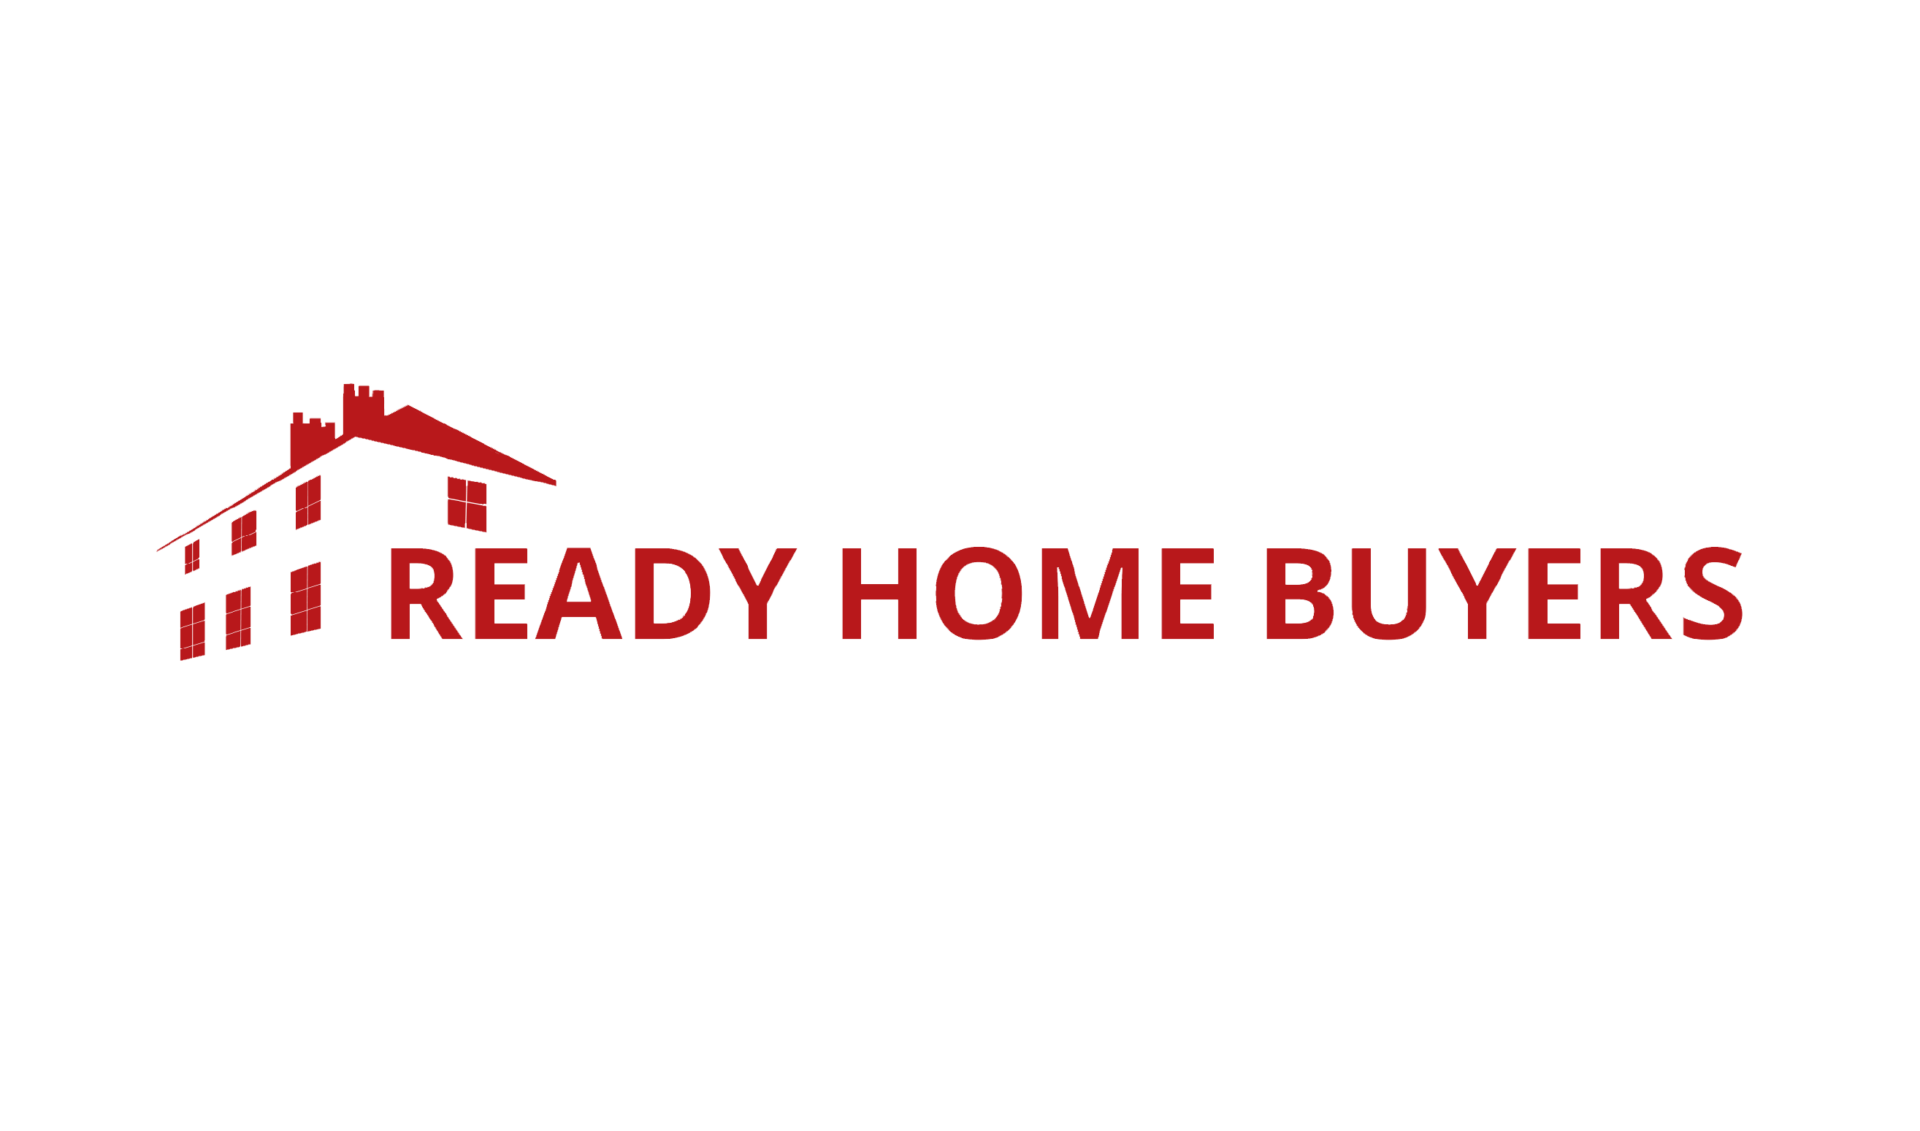 Ready Home Buyers logo